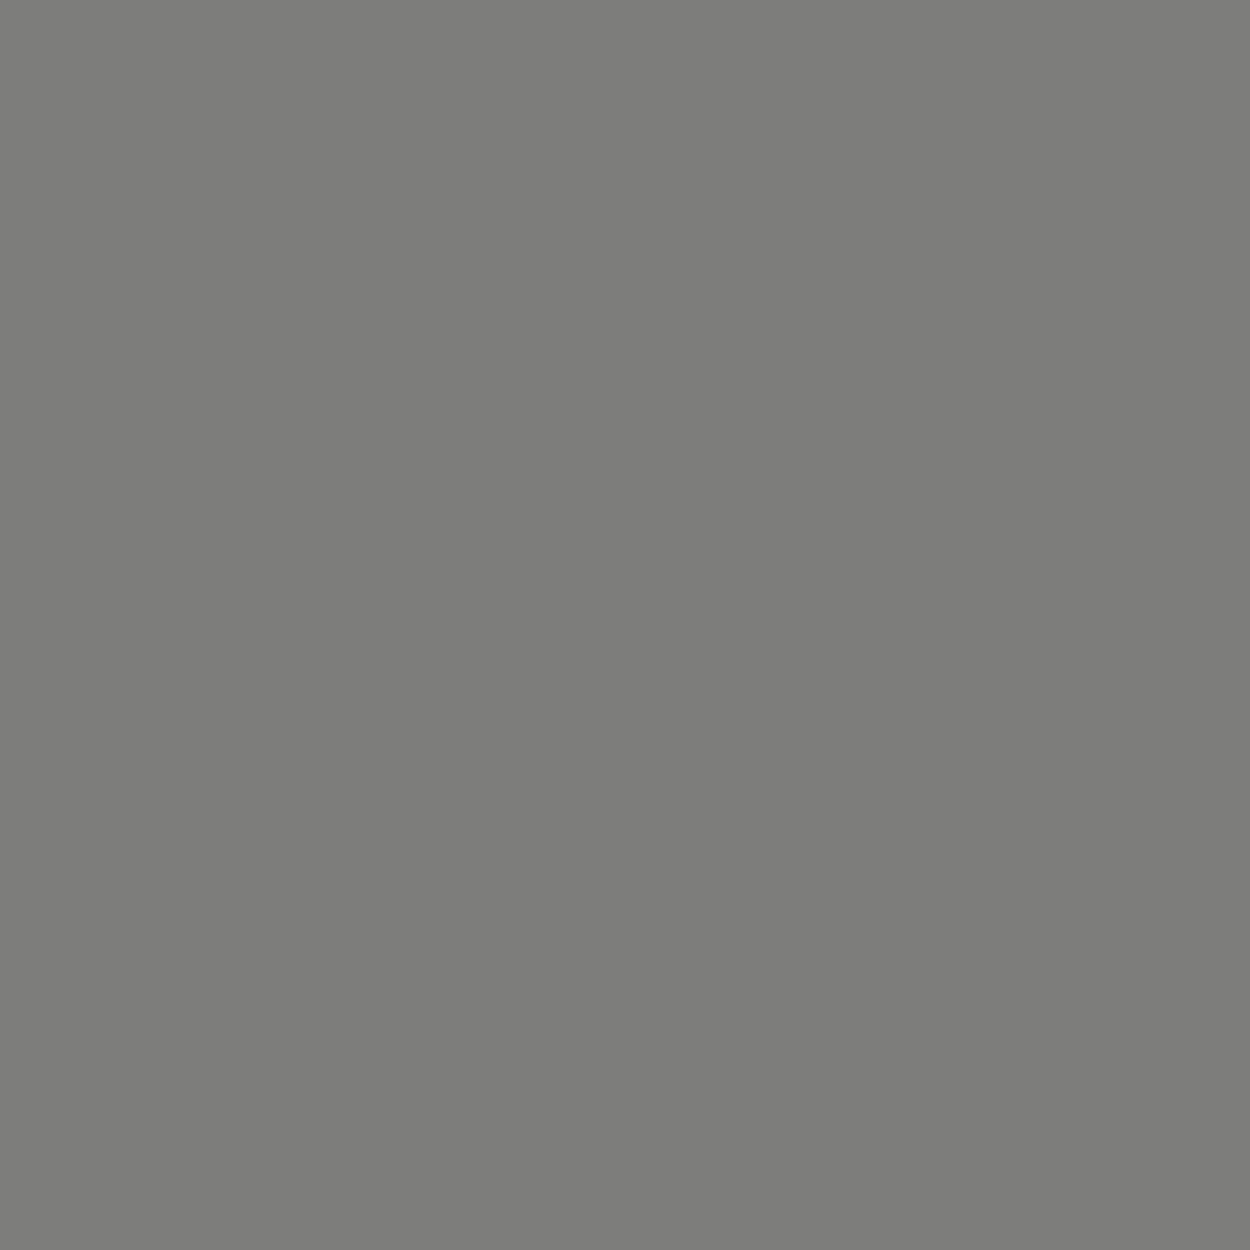 Grigio chiaro Soft (905)